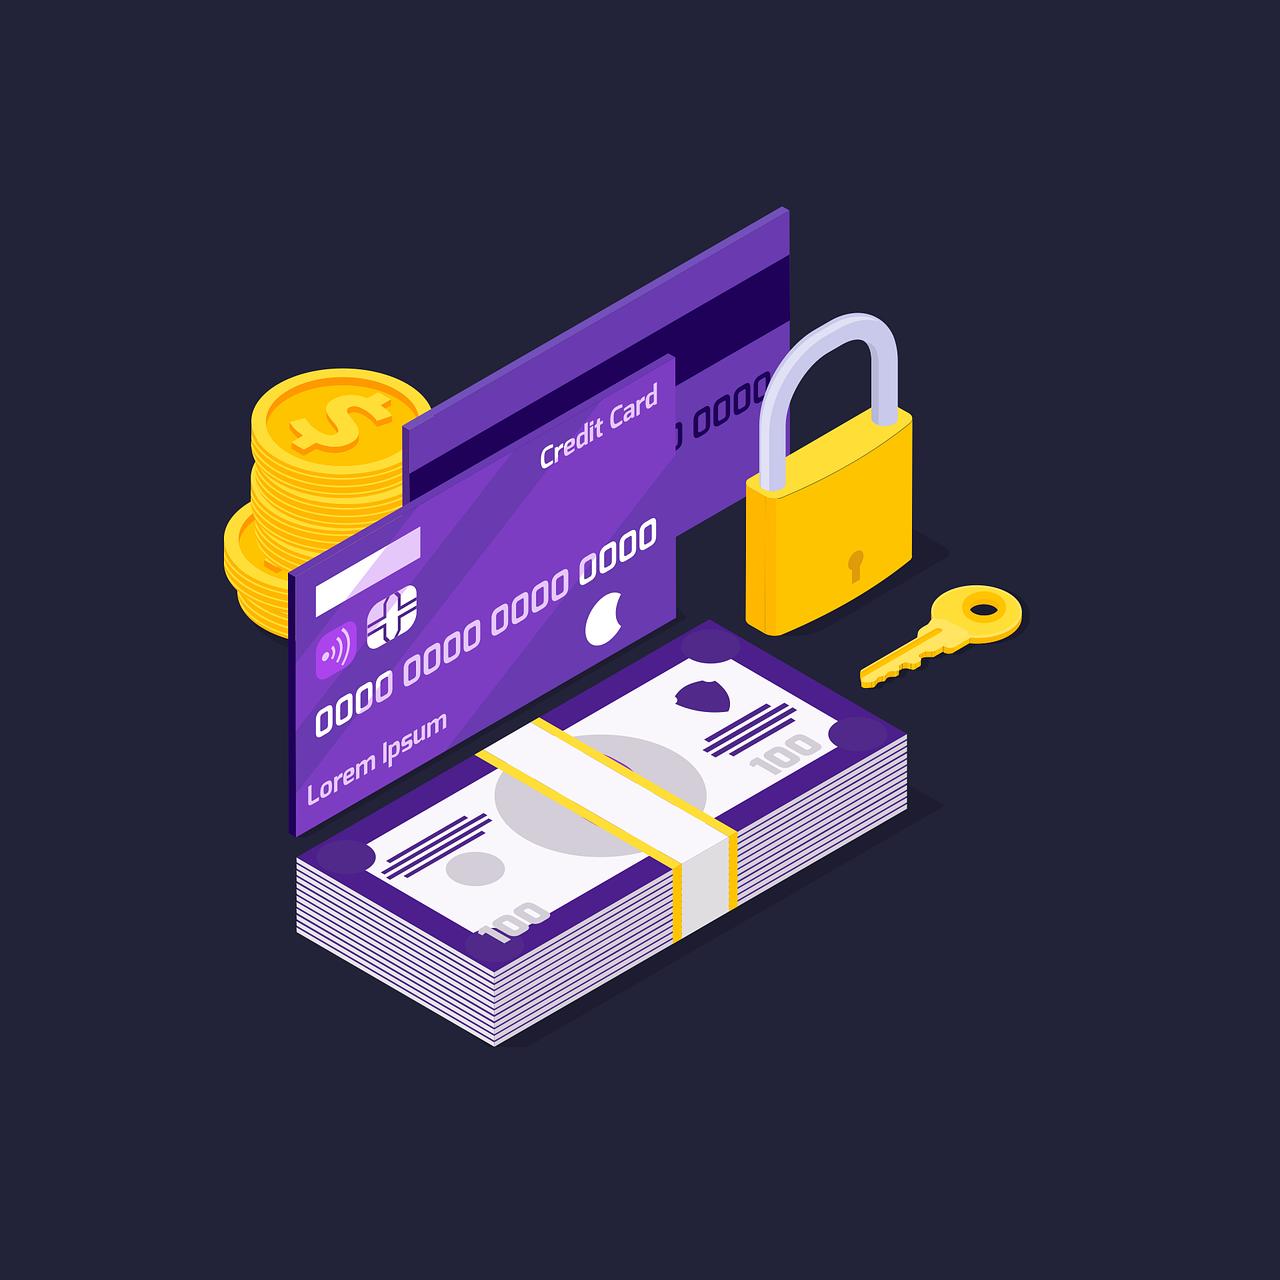 lock, security, credit card